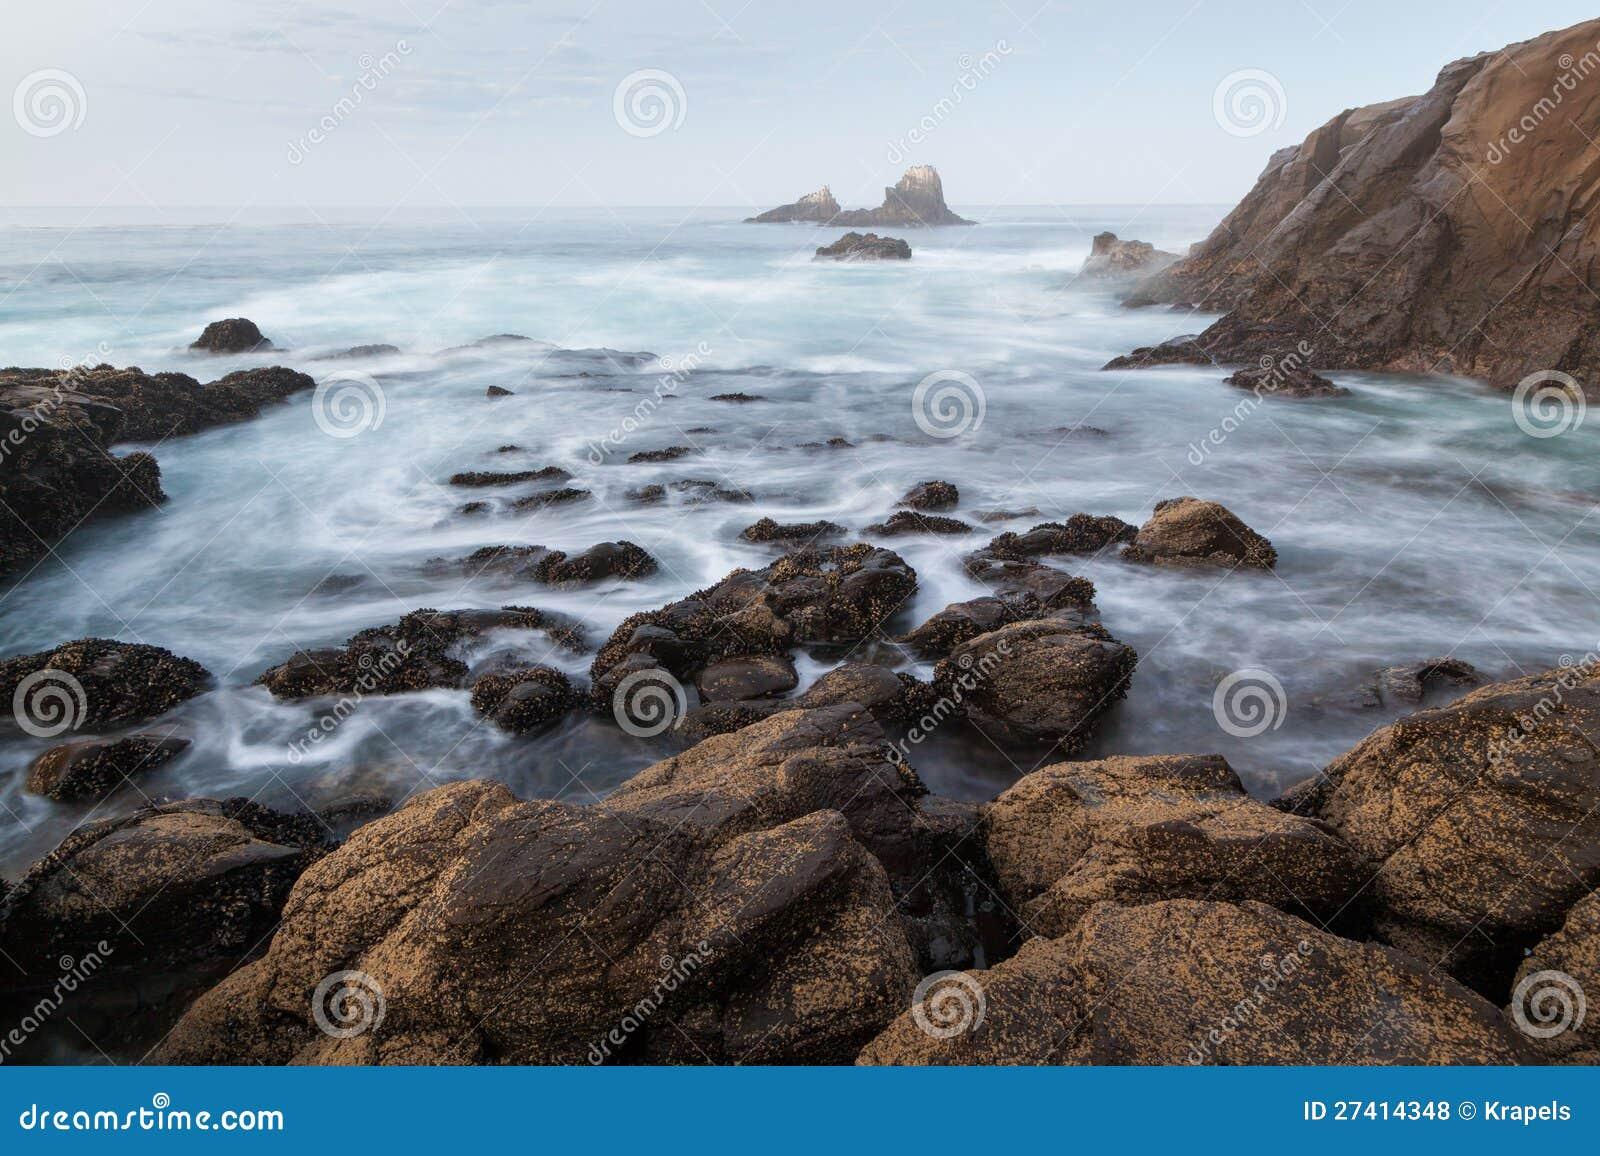 Seal Beach Irvine Ca